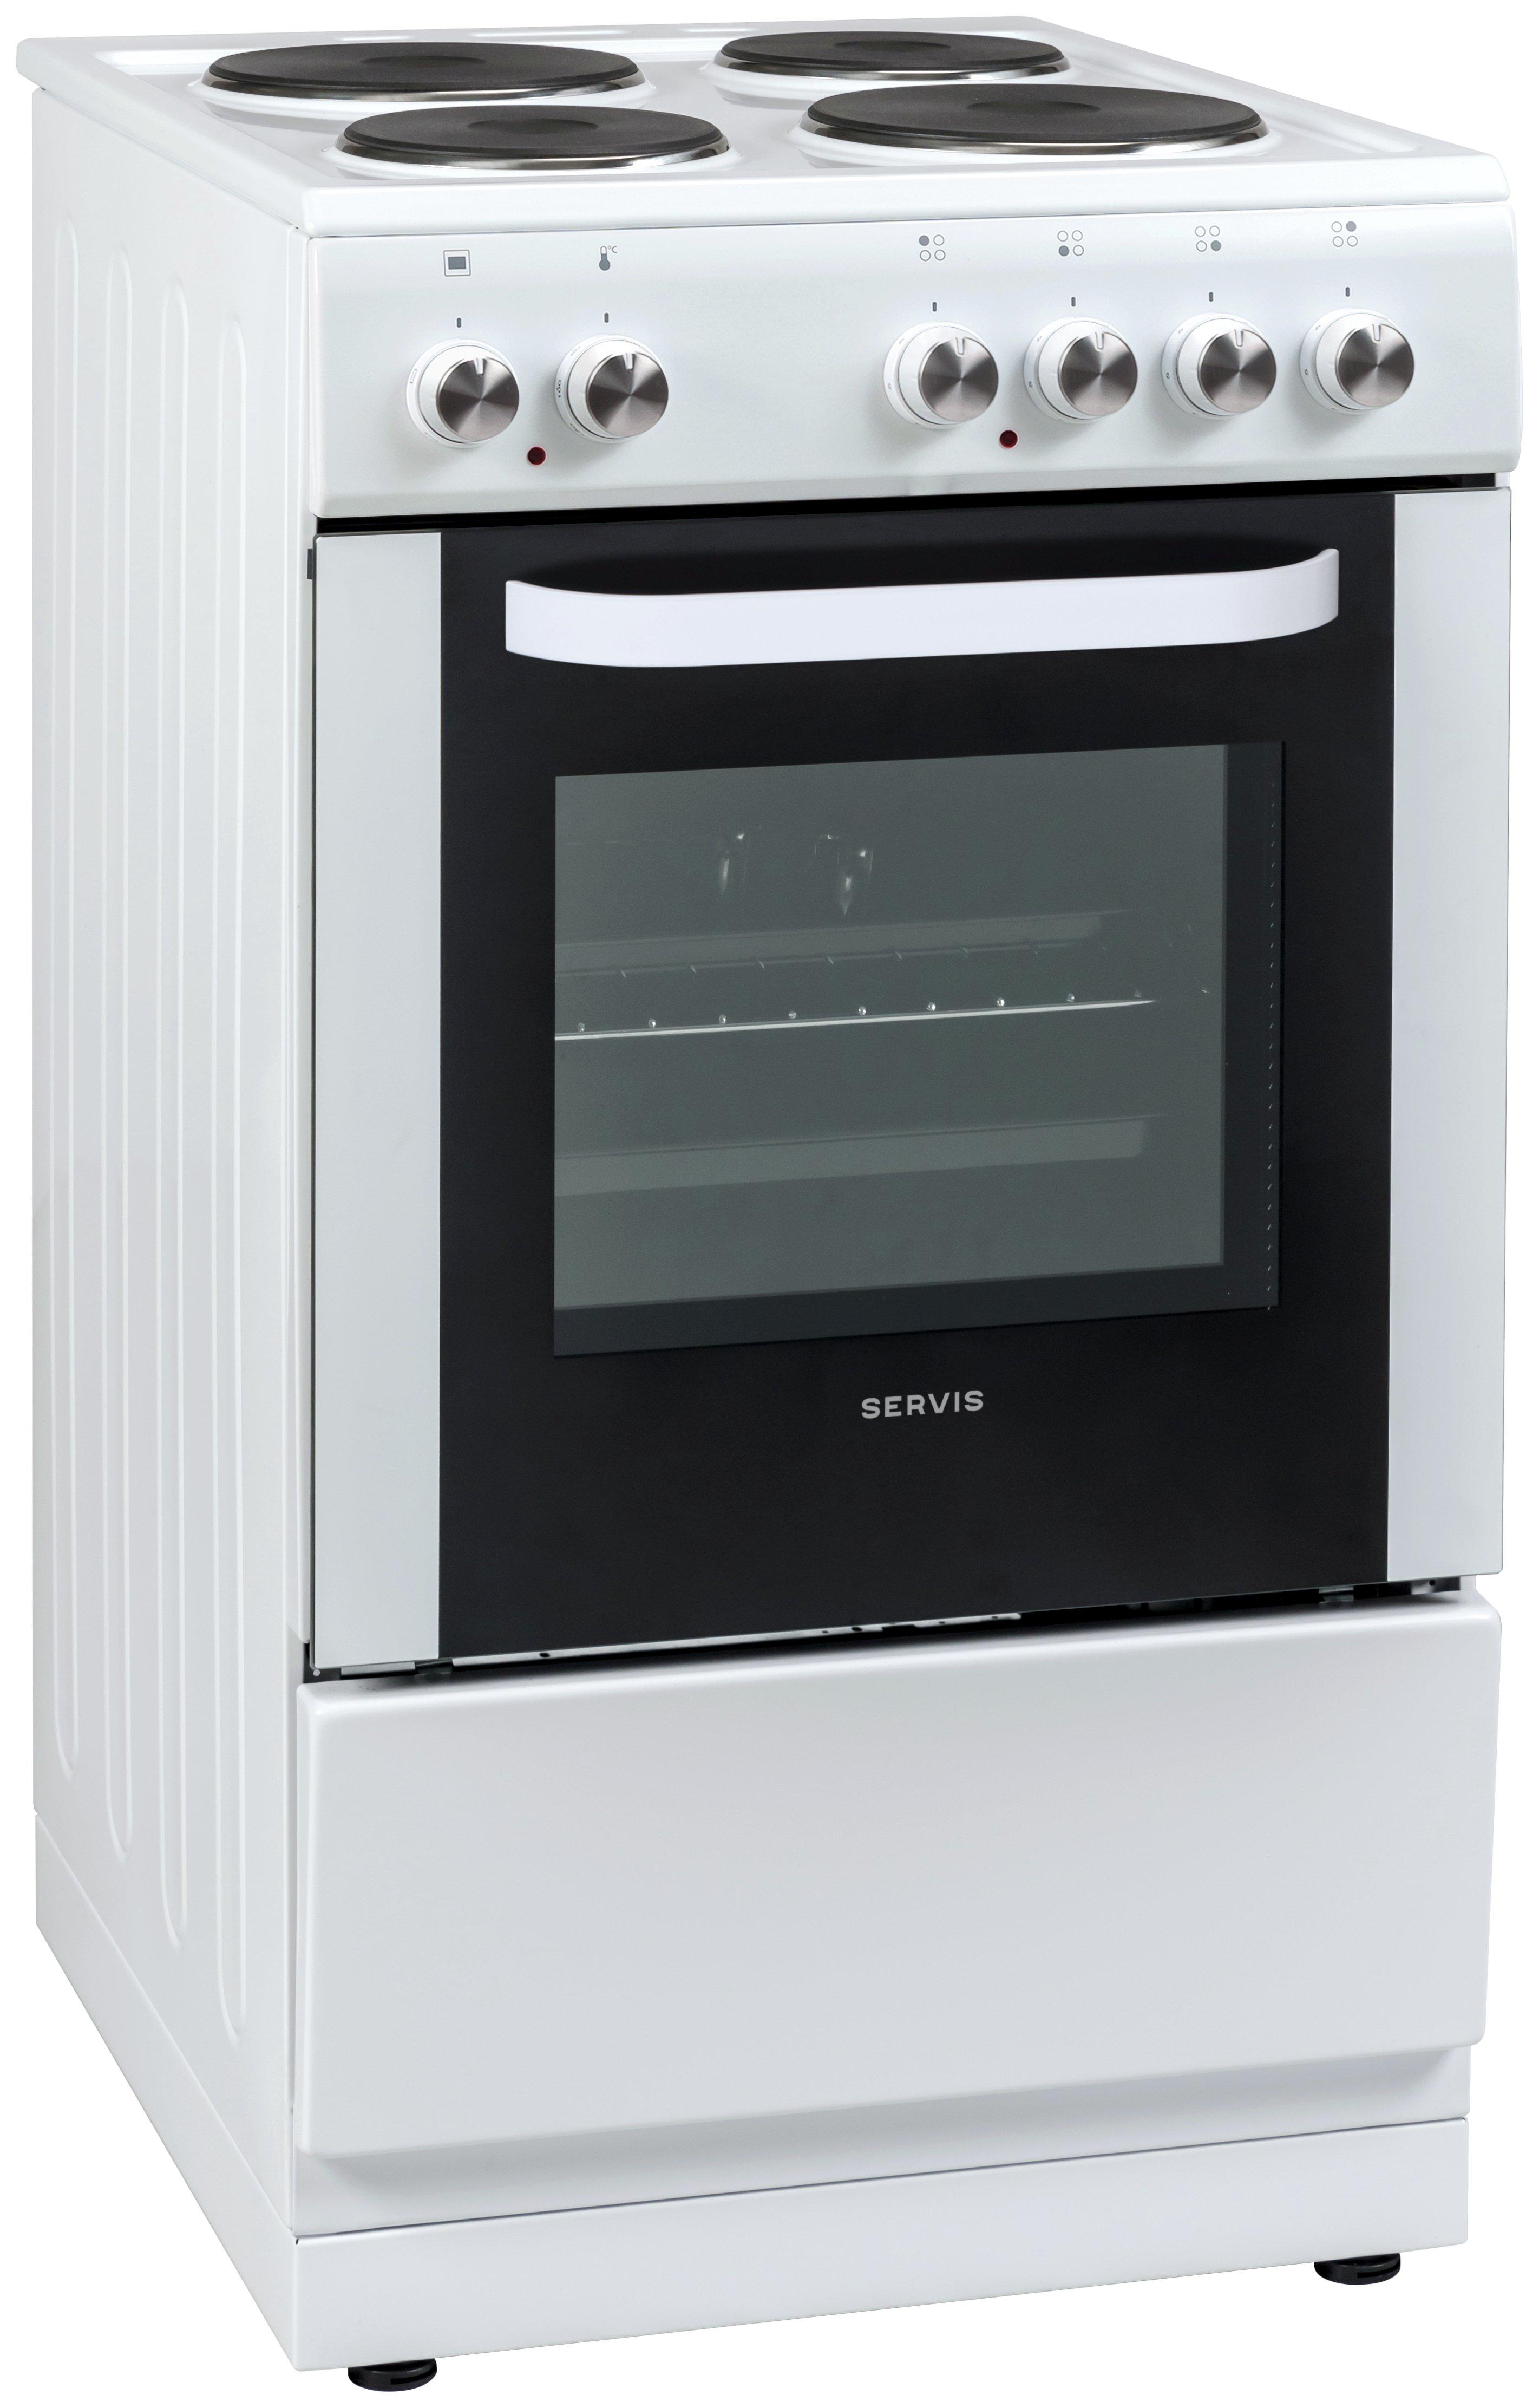 servis sse50w electric cooker review. Black Bedroom Furniture Sets. Home Design Ideas